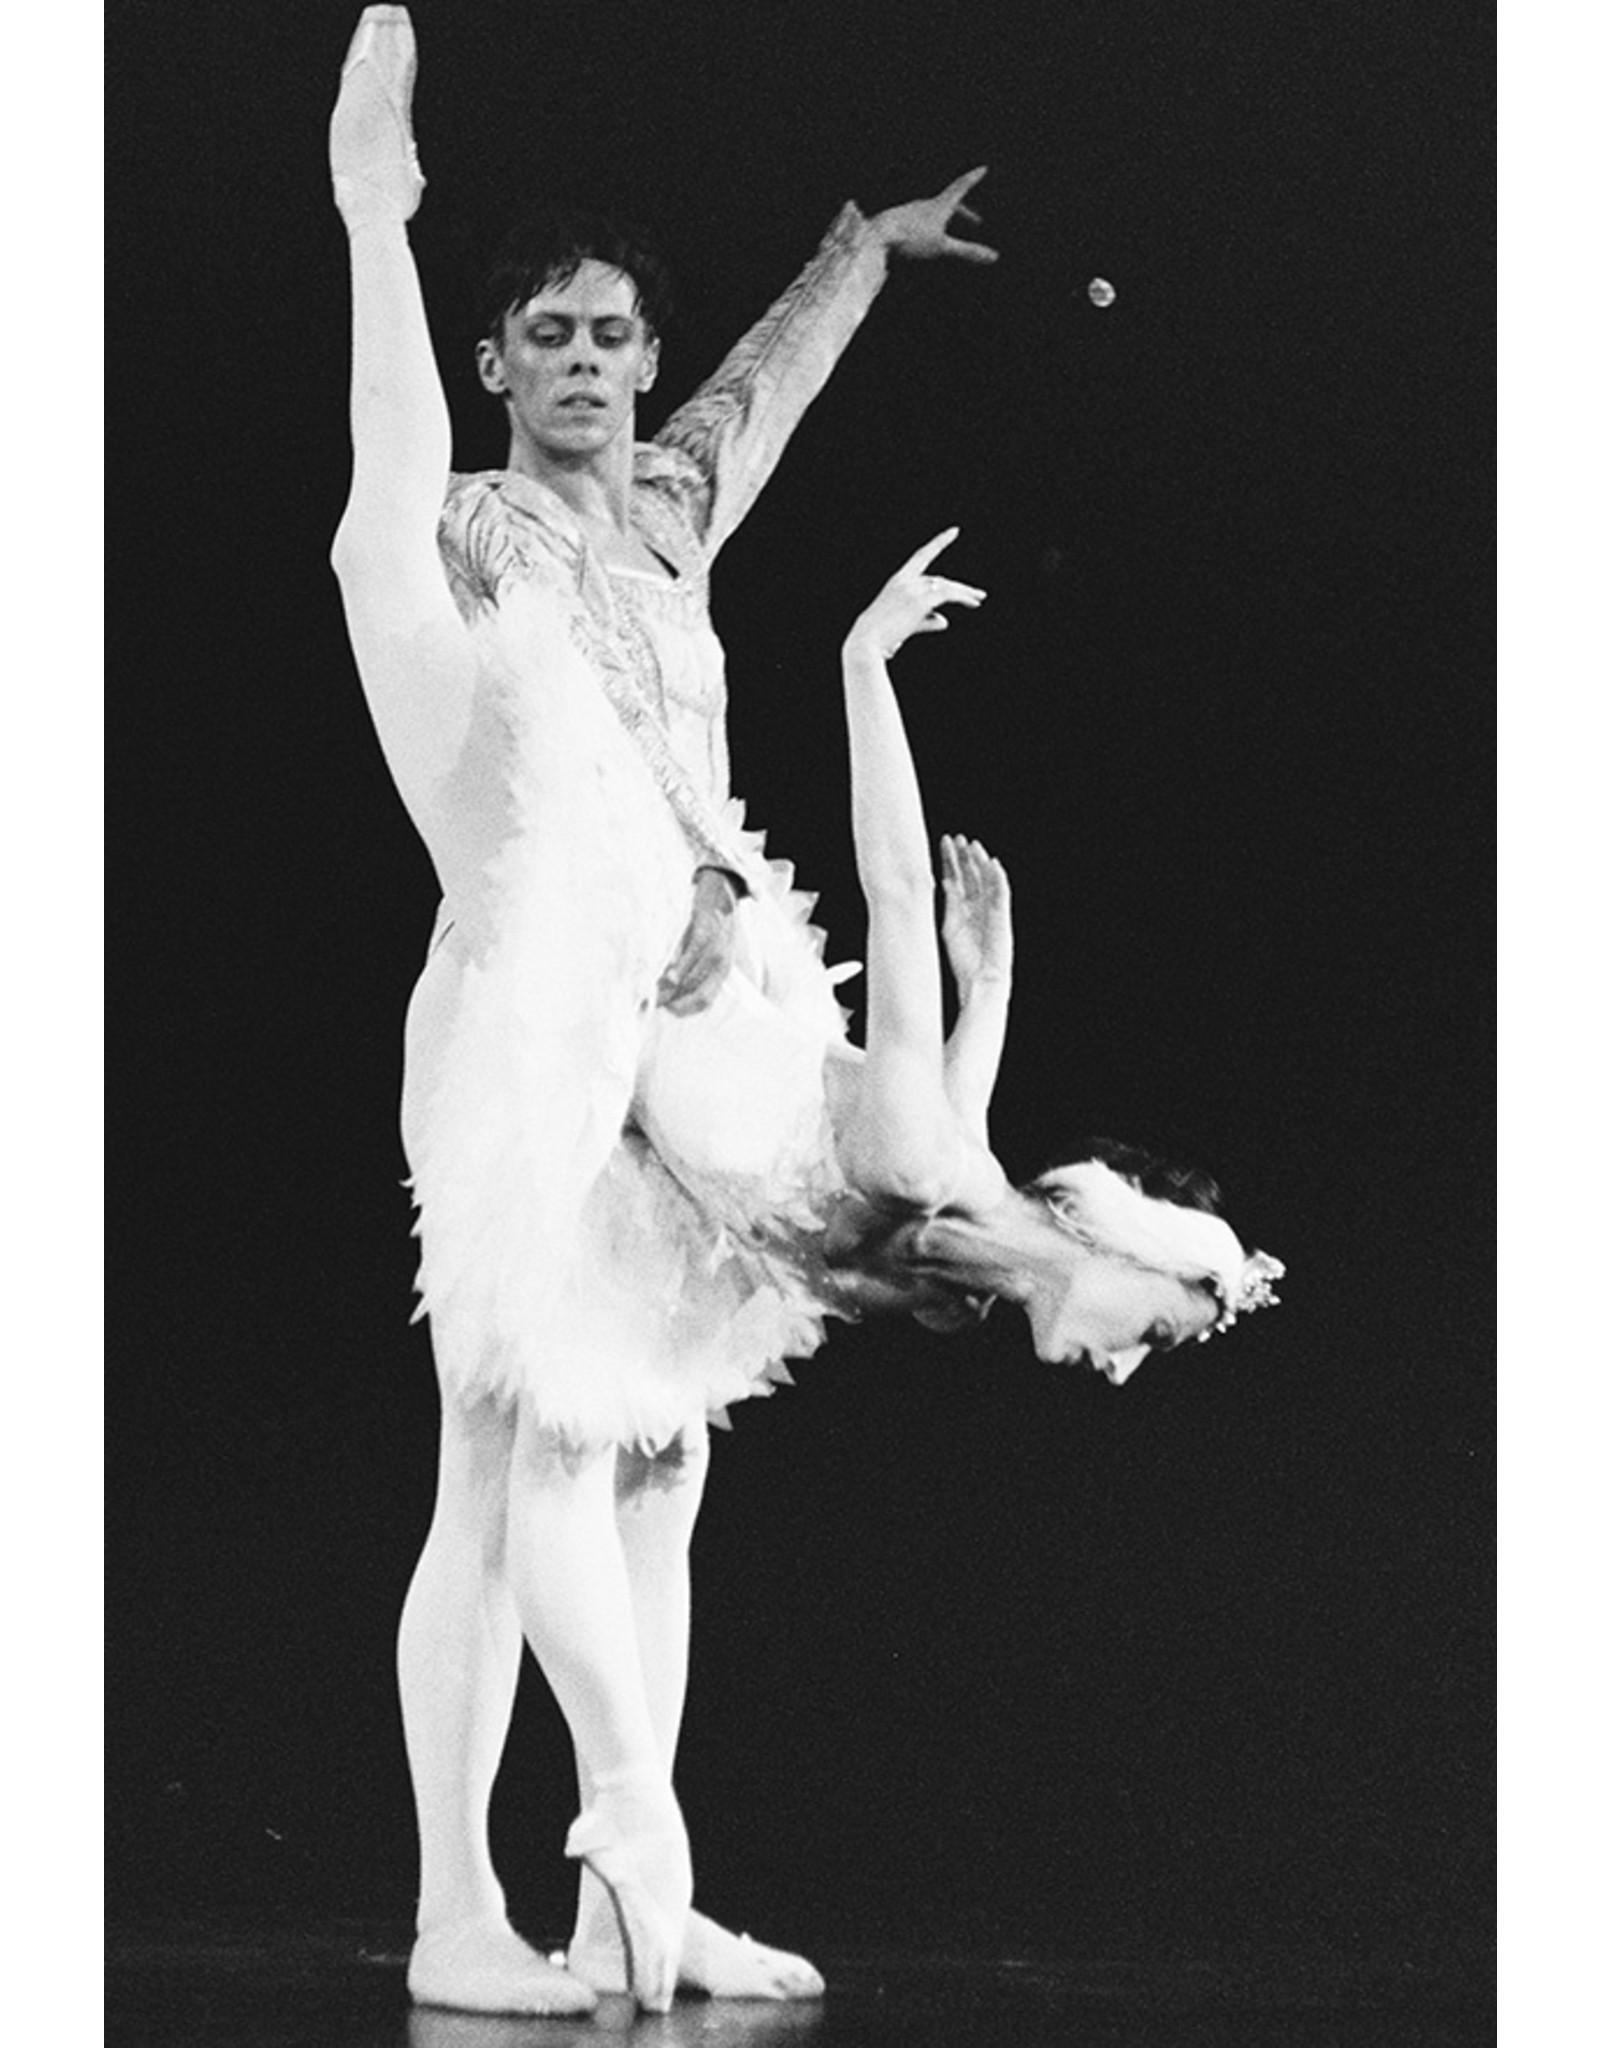 Colin Jones Colin Jones (26),Daria Klimentova as Odette and Dmitri Gruzdyev as prince Siegfried in Swan Lake, English National Ballet, Sydney, Australia, 1999